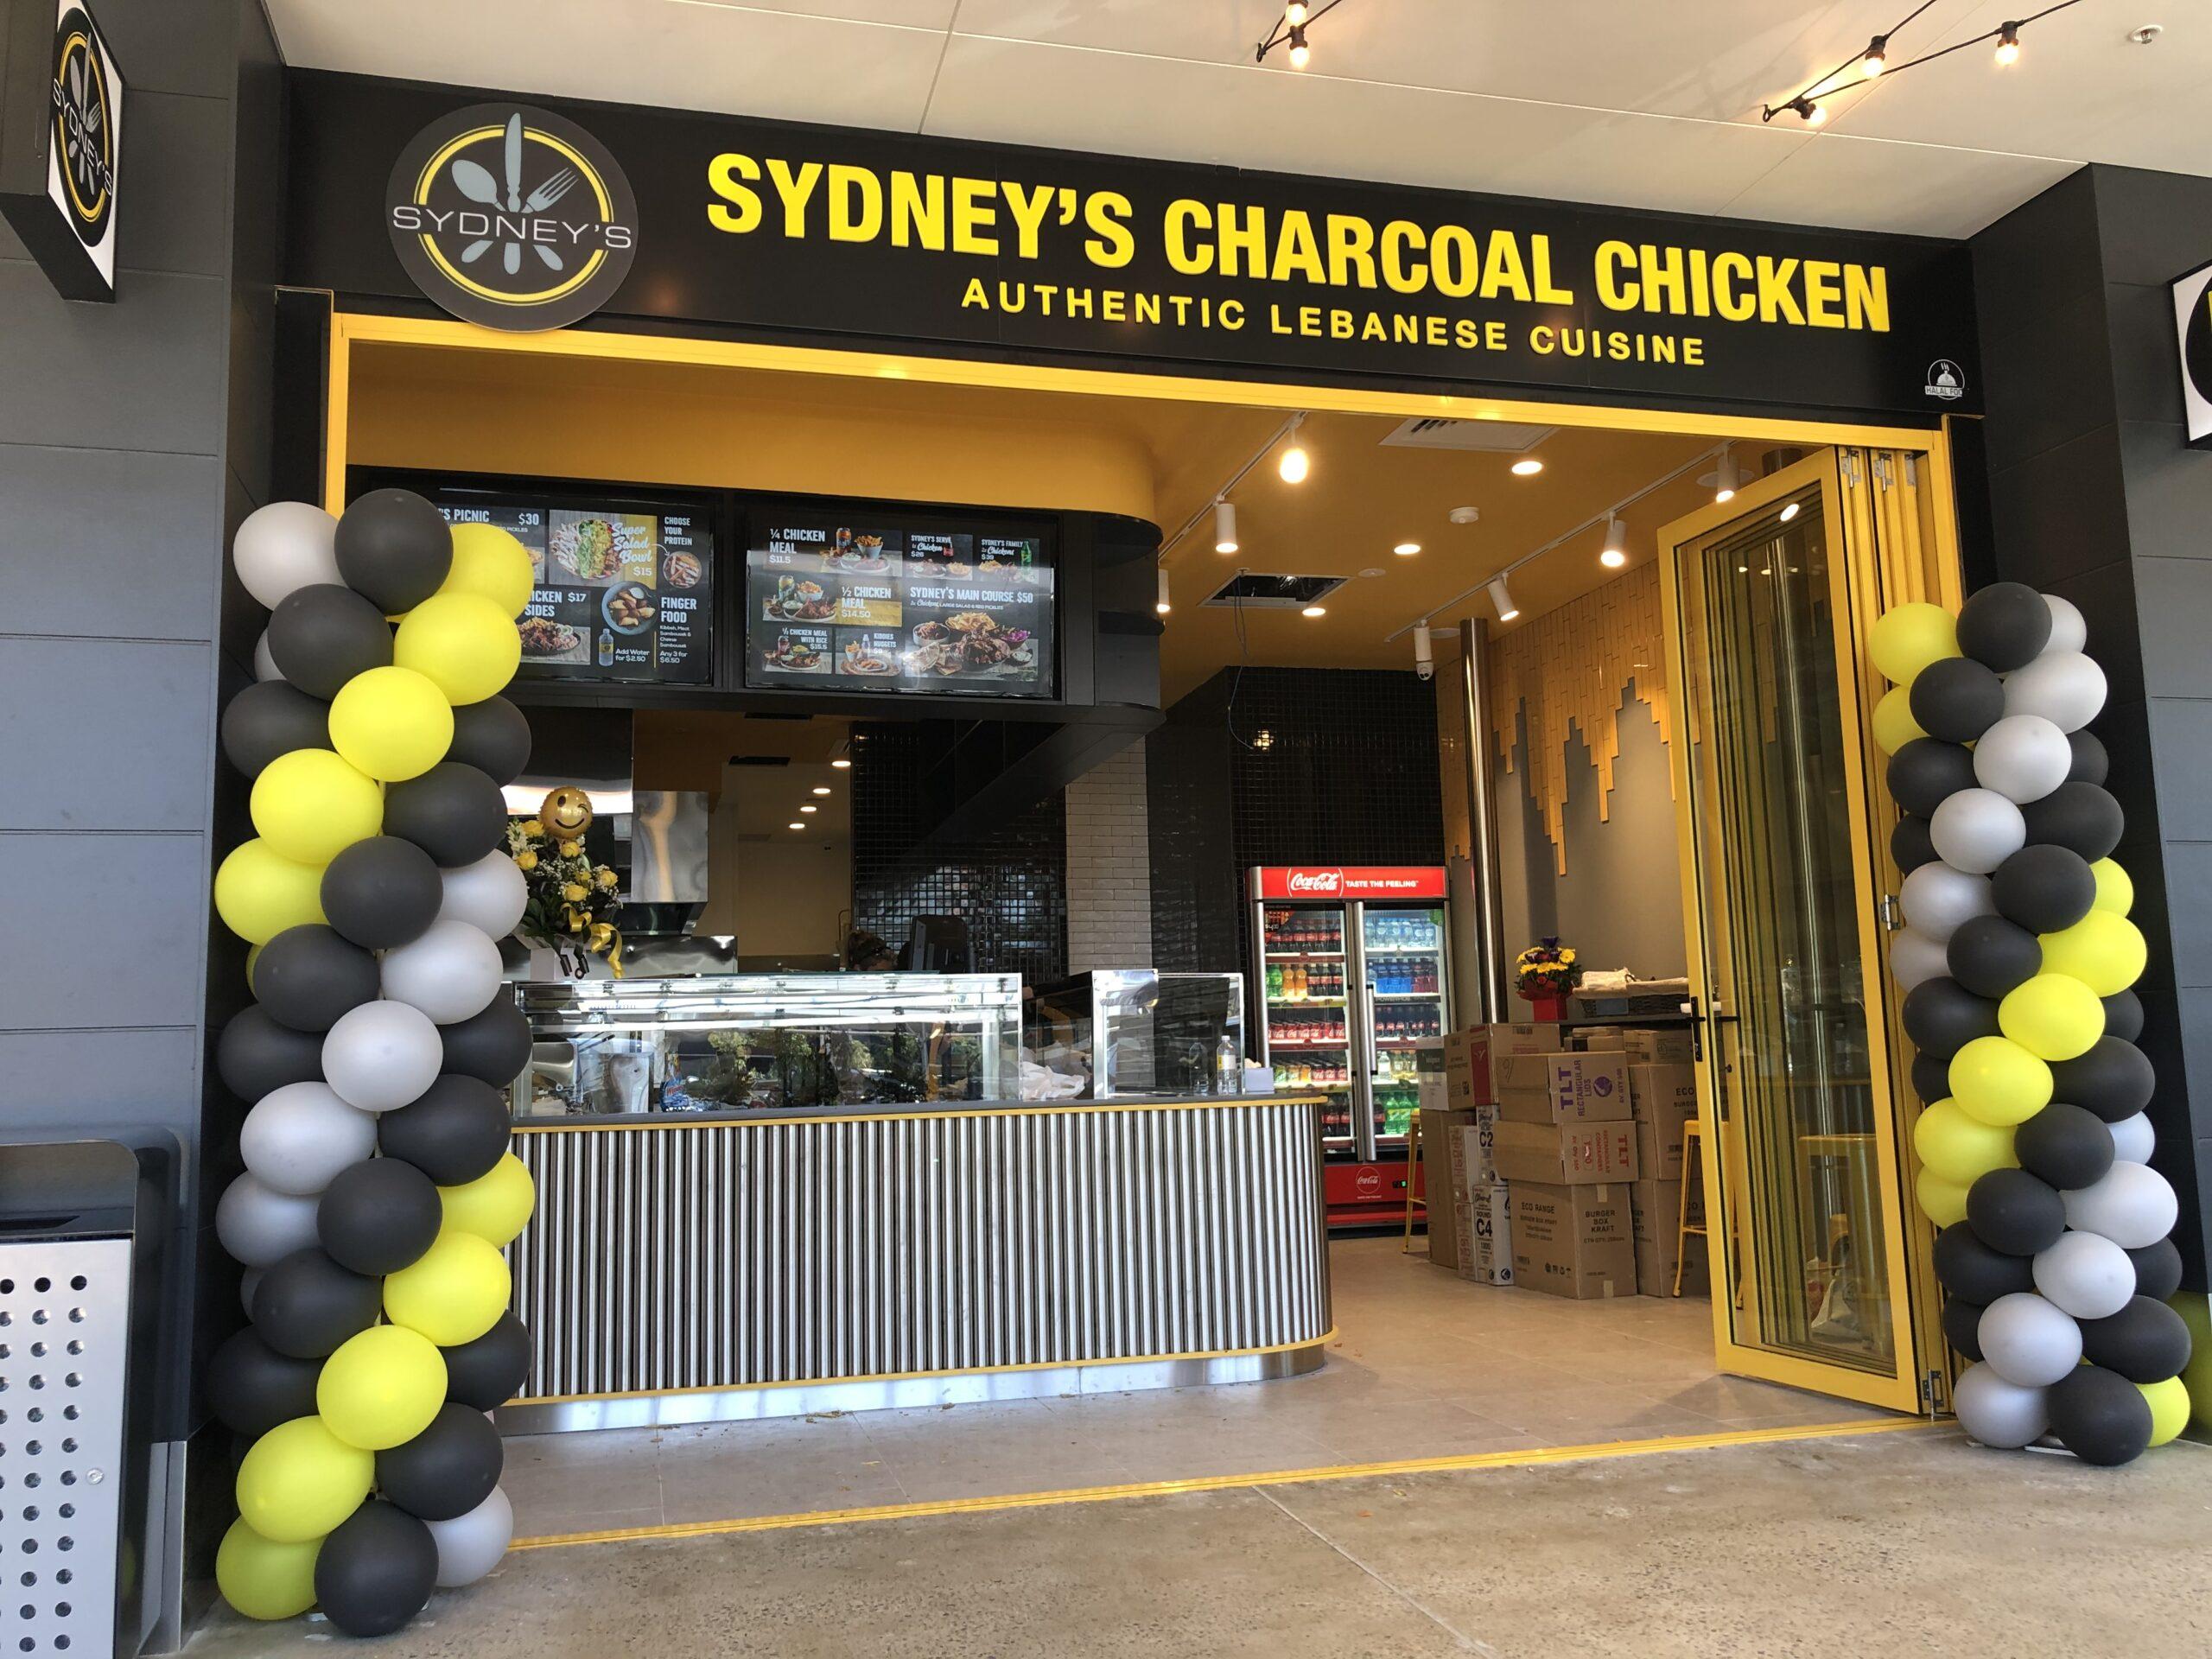 Sydney Charocal Chicken